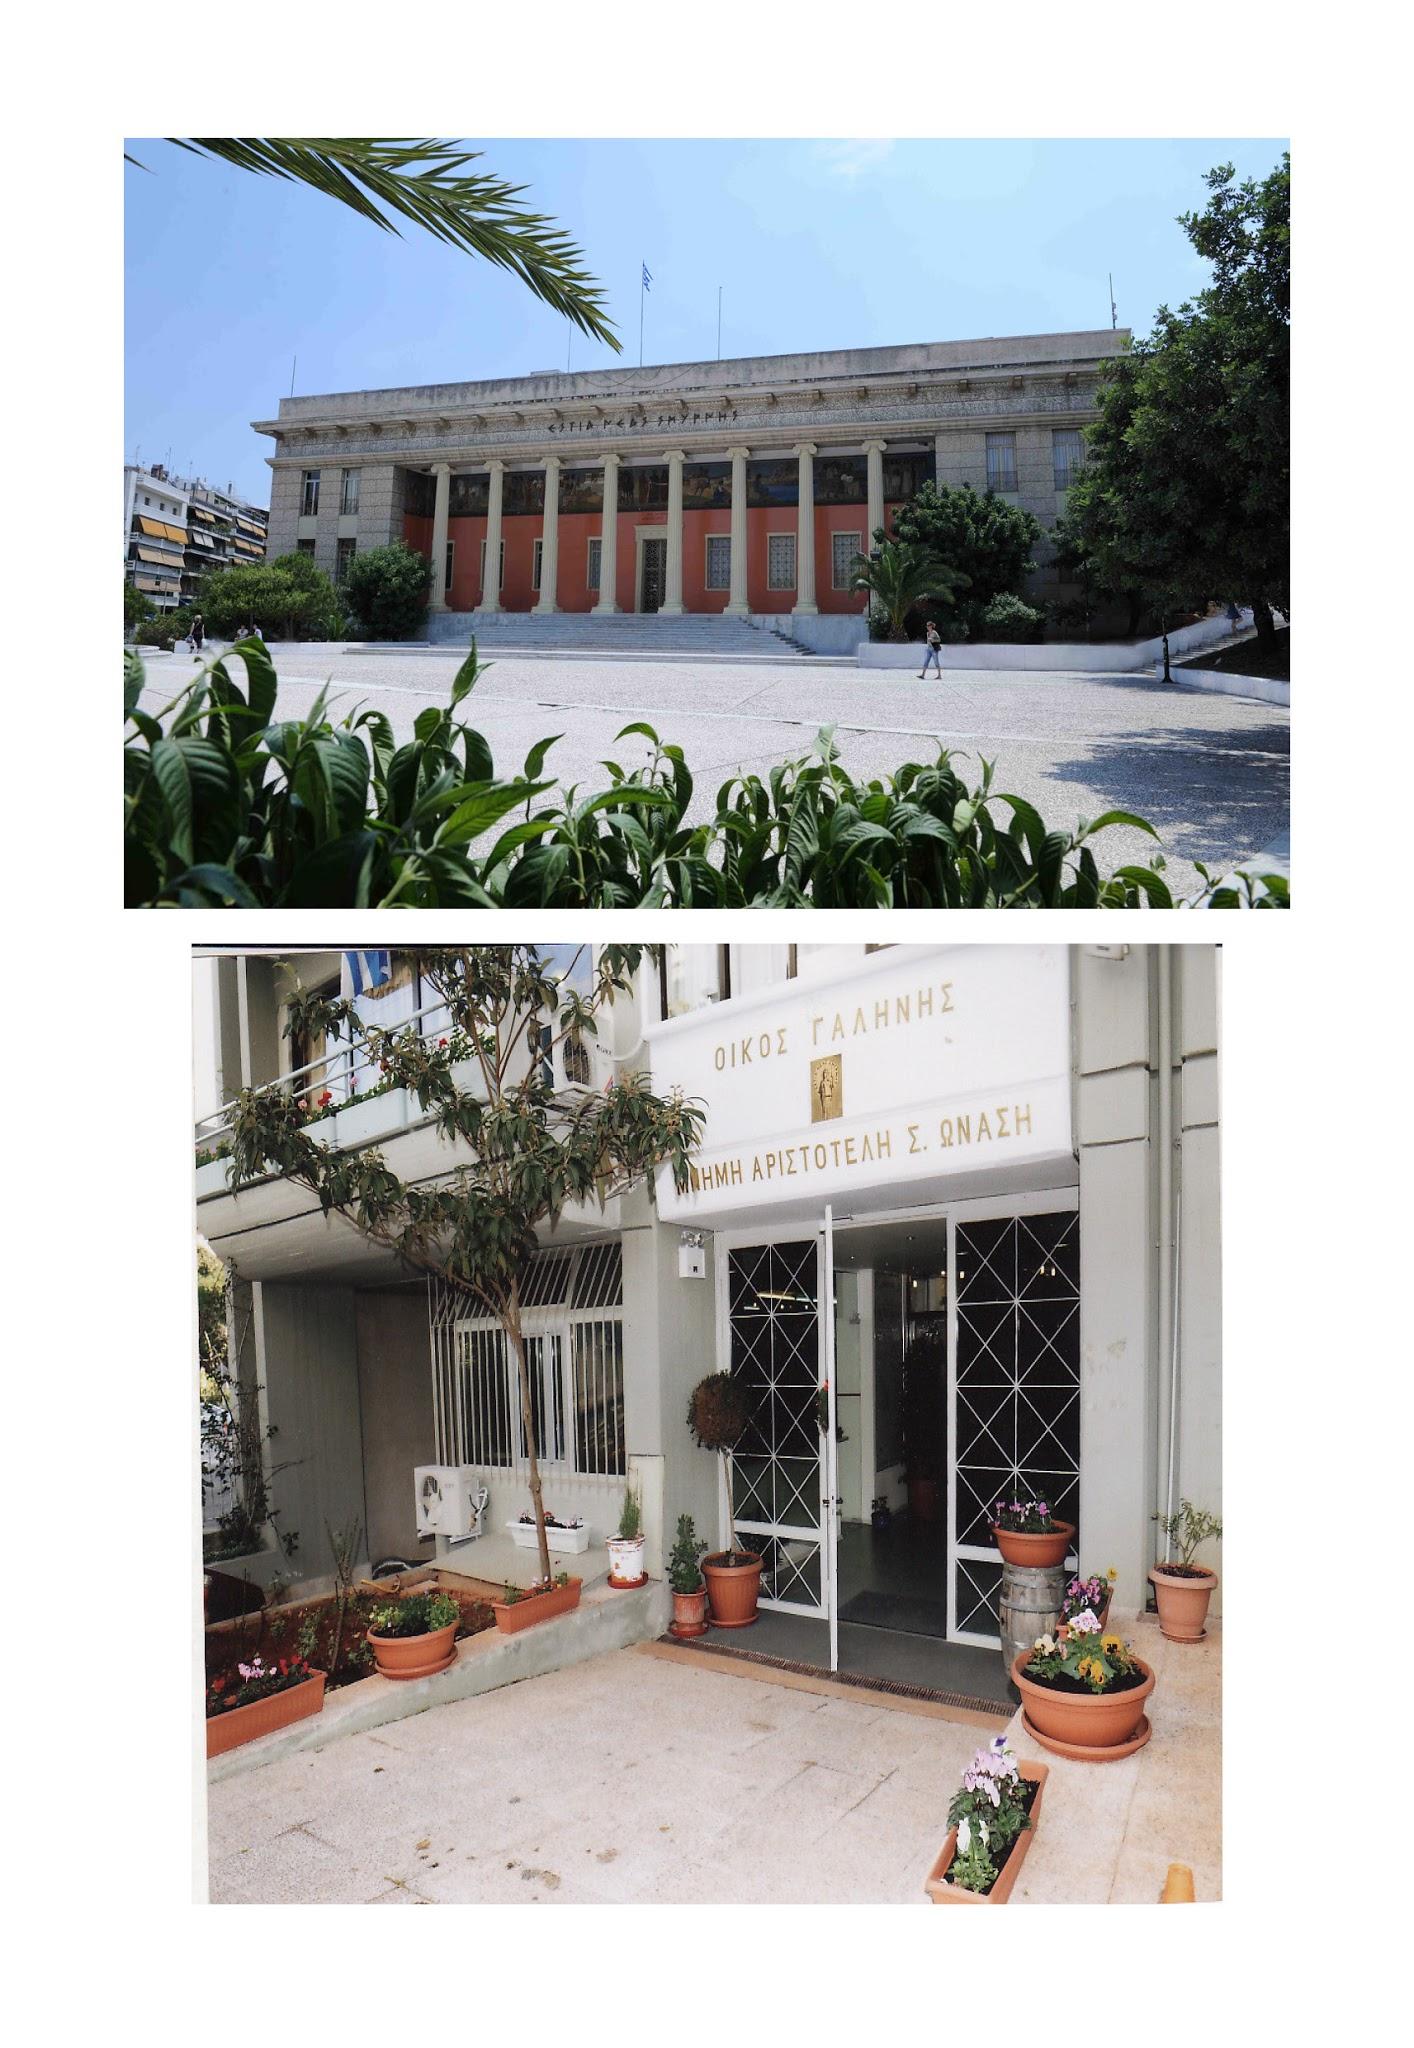 Photo: ΕΣΤΙΑ ΝΕΑΣ ΣΜΥΡΝΗΣ: «Το θαύμα της Πίστης στις Αθάνατες αξίες, στον Εθελοντισμό και στη Συλλογικότητα», της Βιργινίας Χαμουδοπούλου-Κωνσταντινίδου, Γενικής Γραμματέως της Εστίας, Δεκέμβριος 2015, σελ. 2.